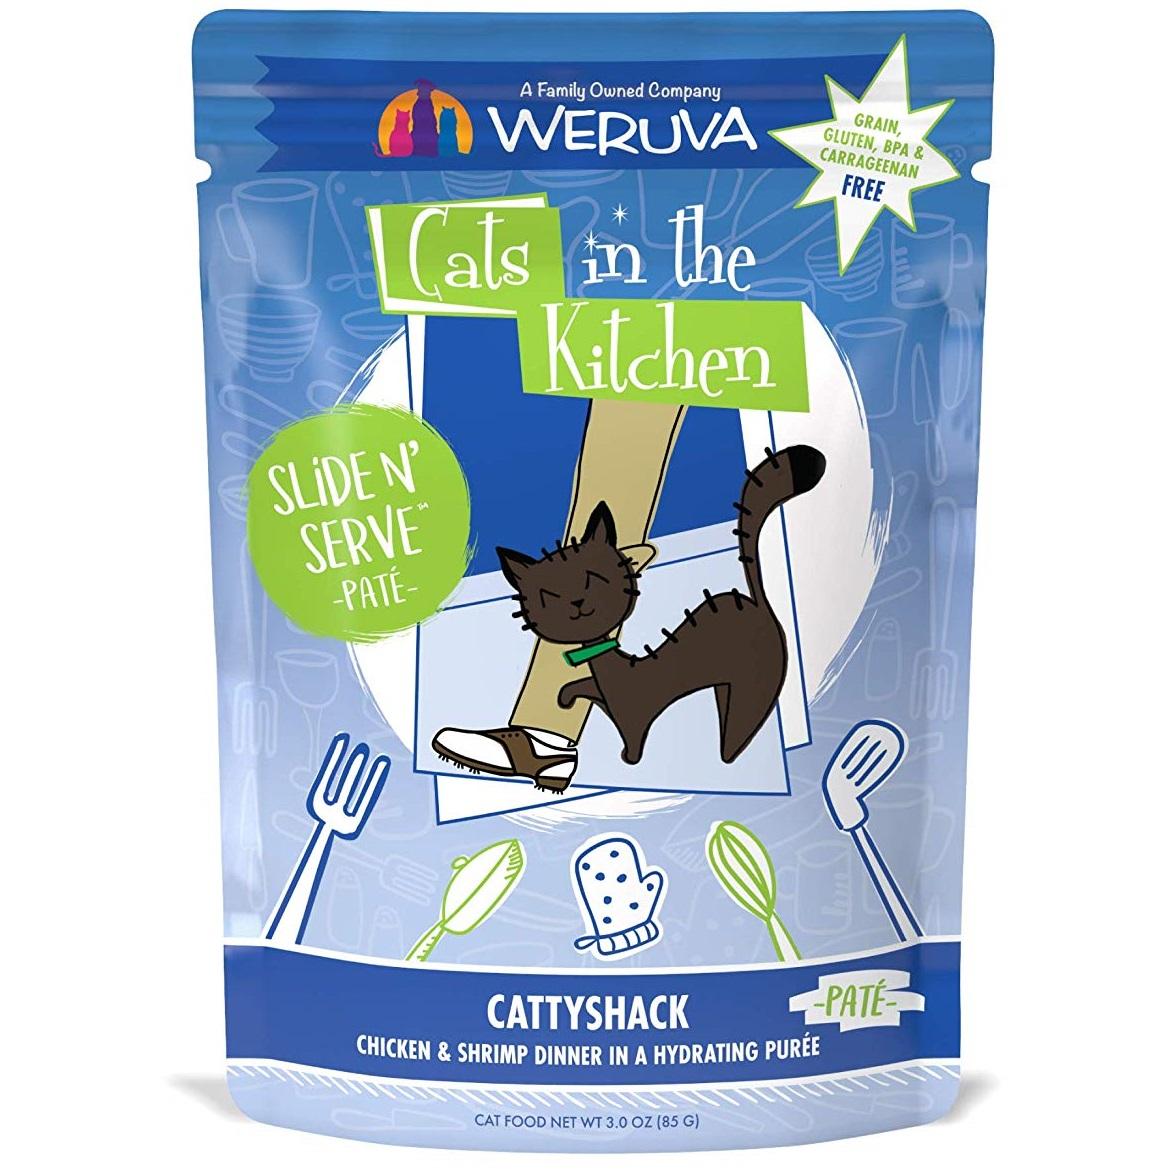 Weruva Cats In The Kitchen Pate Cattyshack Chicken & Shrimp Dinner in Puree Grain-Free Wet Cat Food, 3-oz pouch